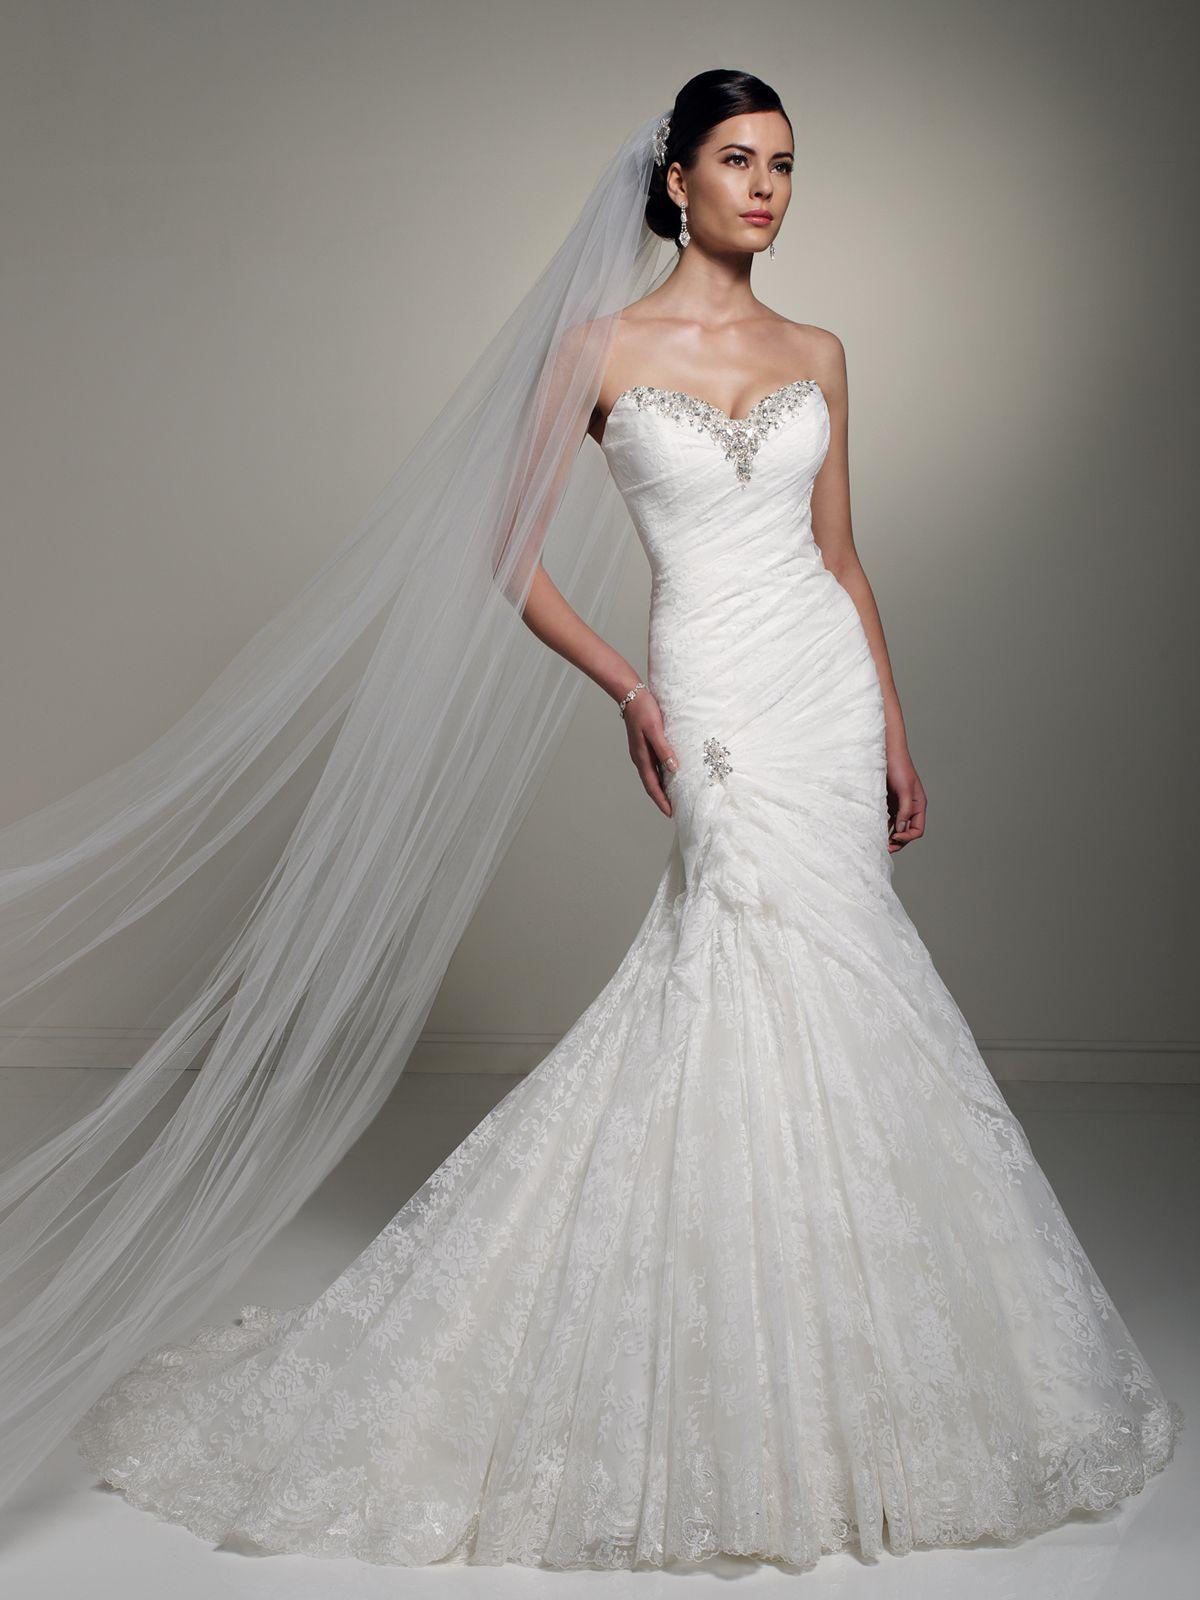 Sophia Tolli Wedding Dresses 2019 For Mon Cheri Bridal Gowns